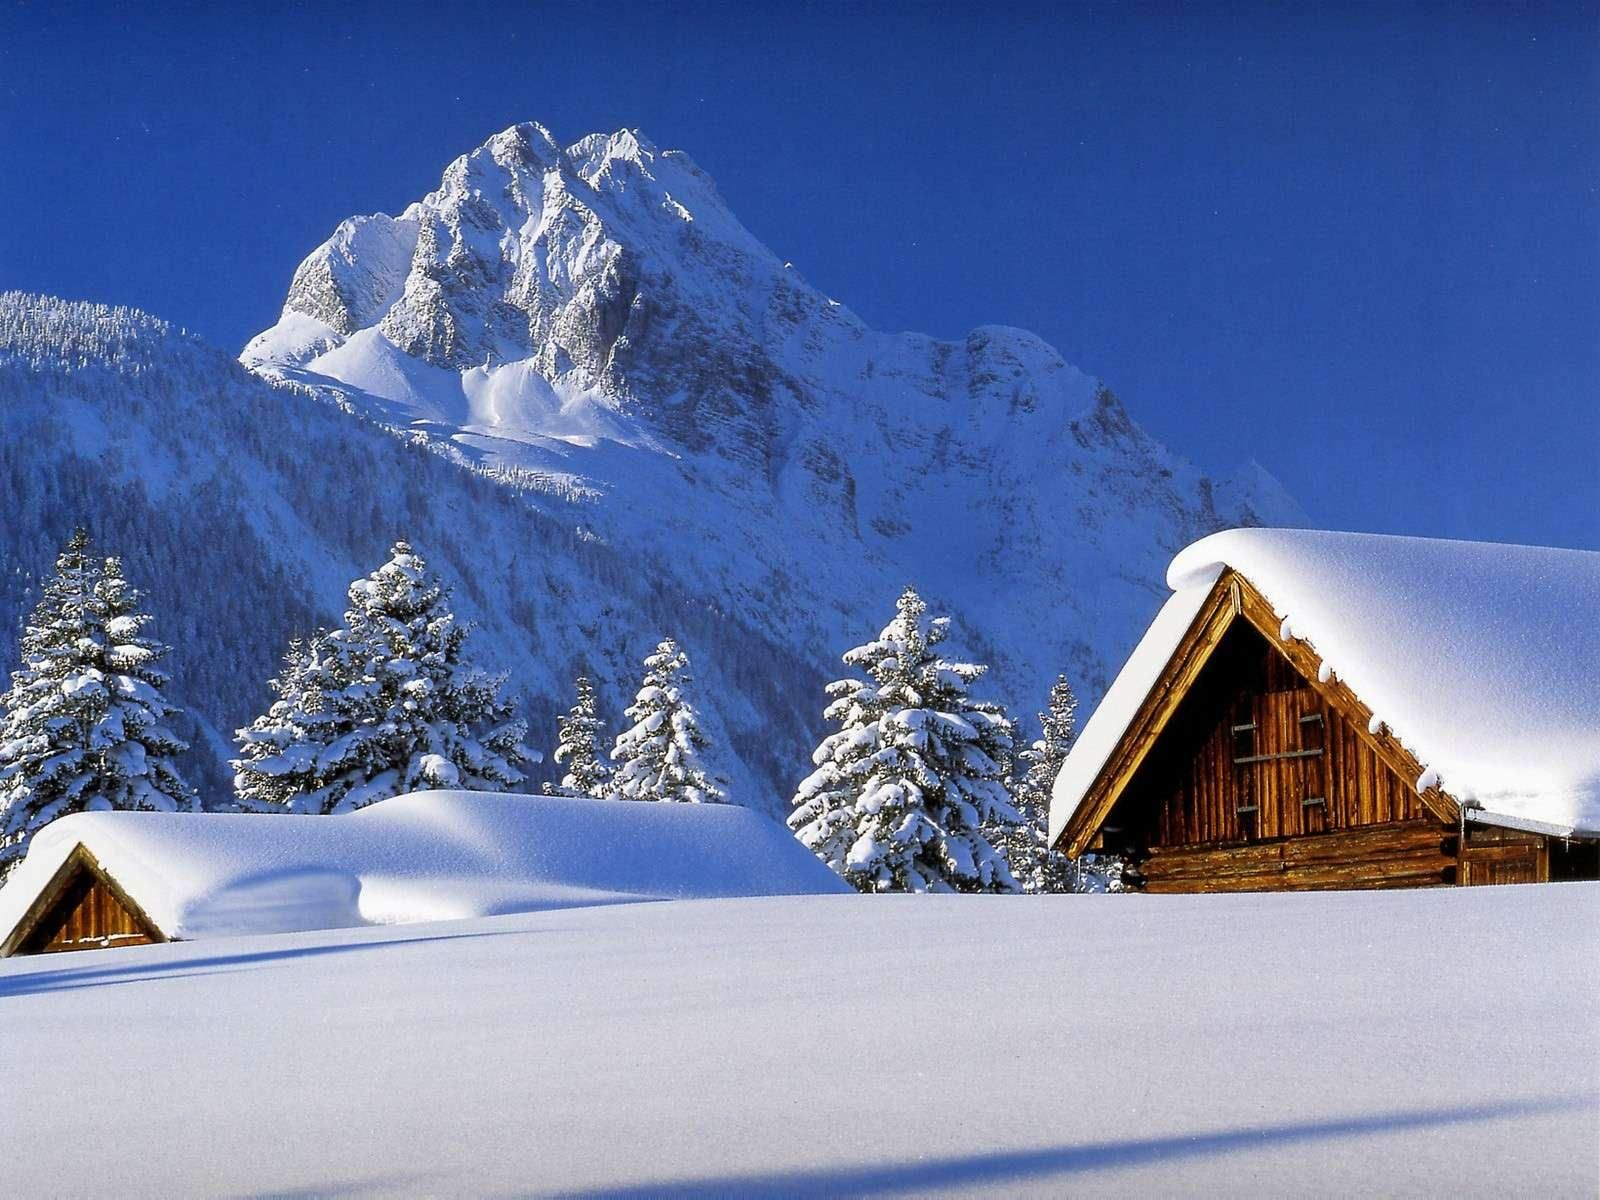 Beautiful Wallpaper Mountain Windows 7 - 2fe4973437ac5c0df43a6a44b5fd6710  Pictures_137255.jpg